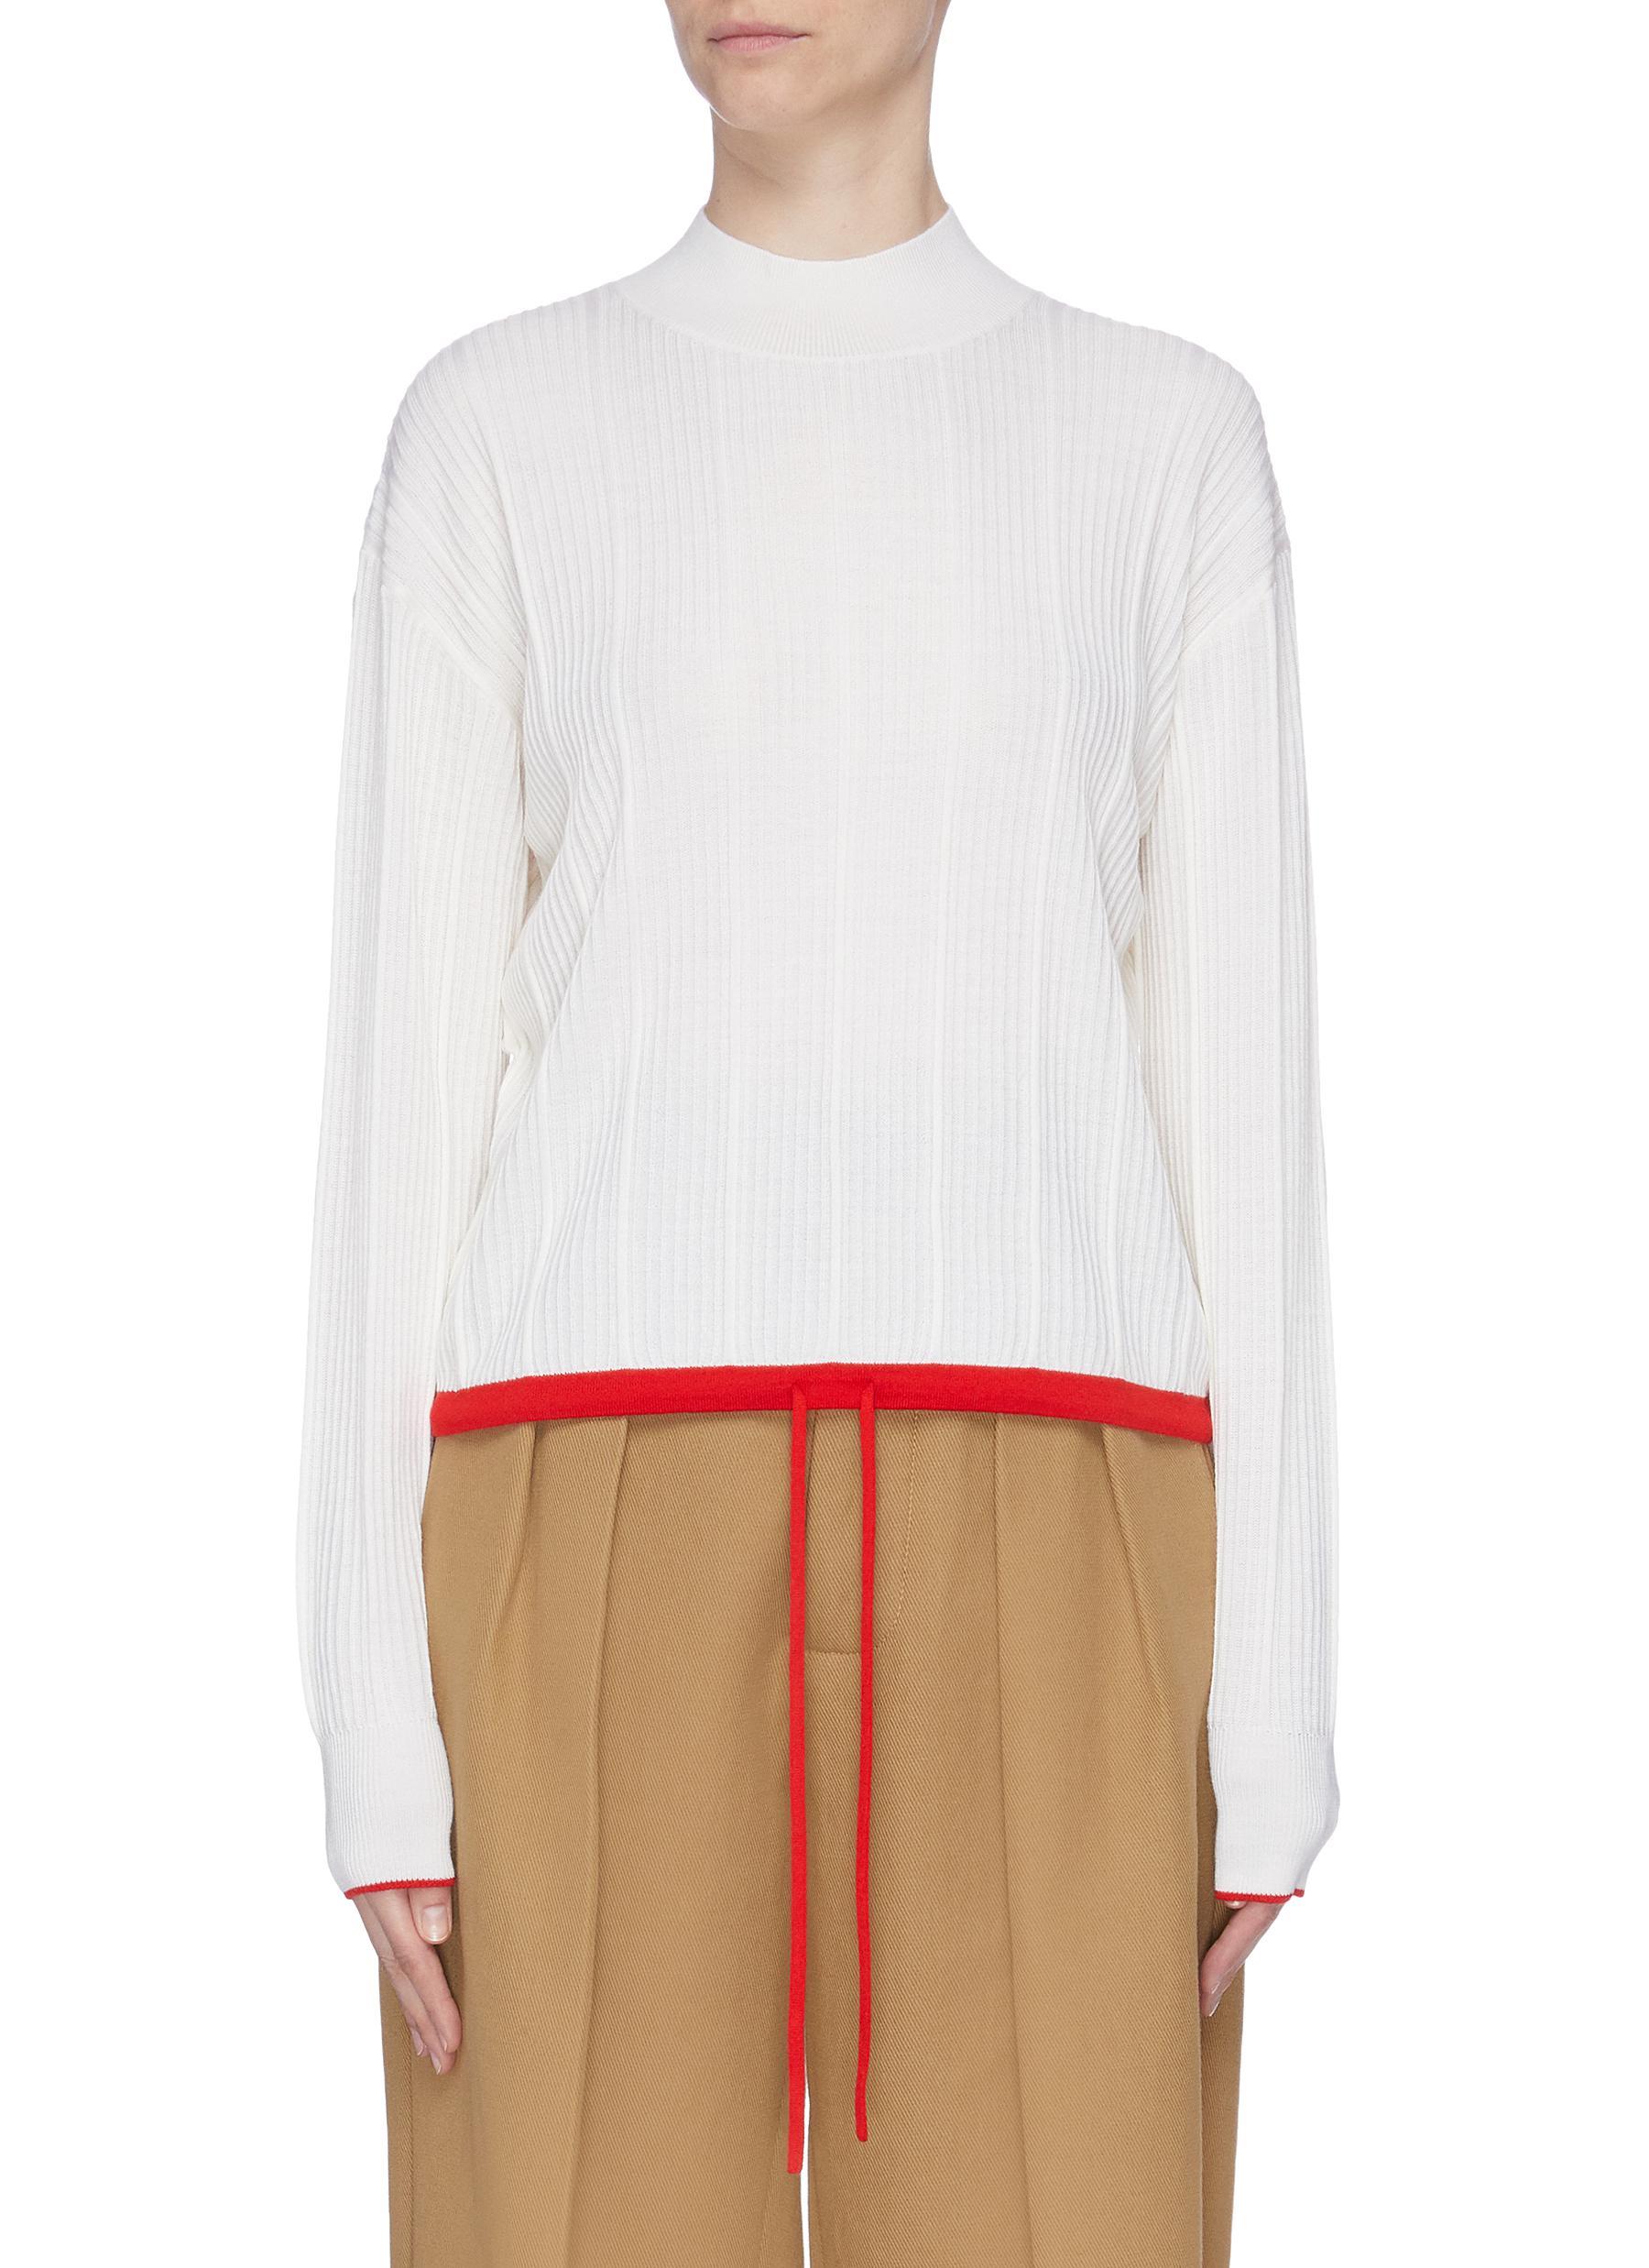 Contrast drawstring rib knit turtleneck hem sweater by Comme Moi